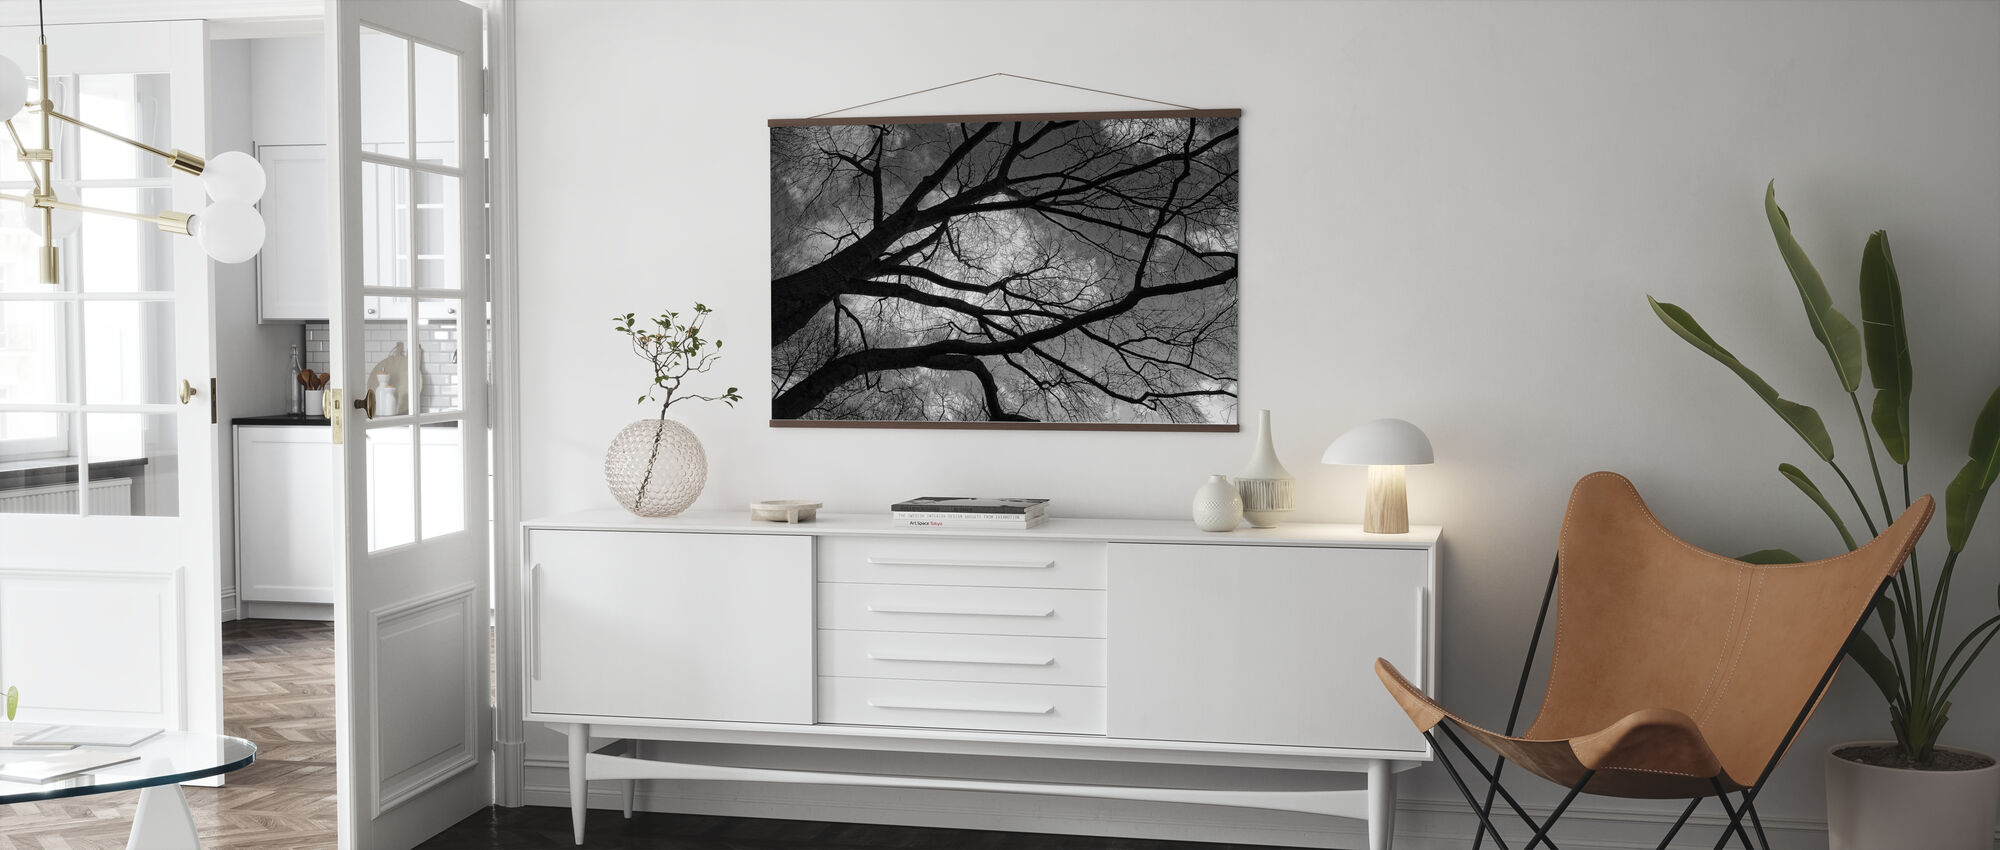 Mørk vinter treet - Plakat - Stue